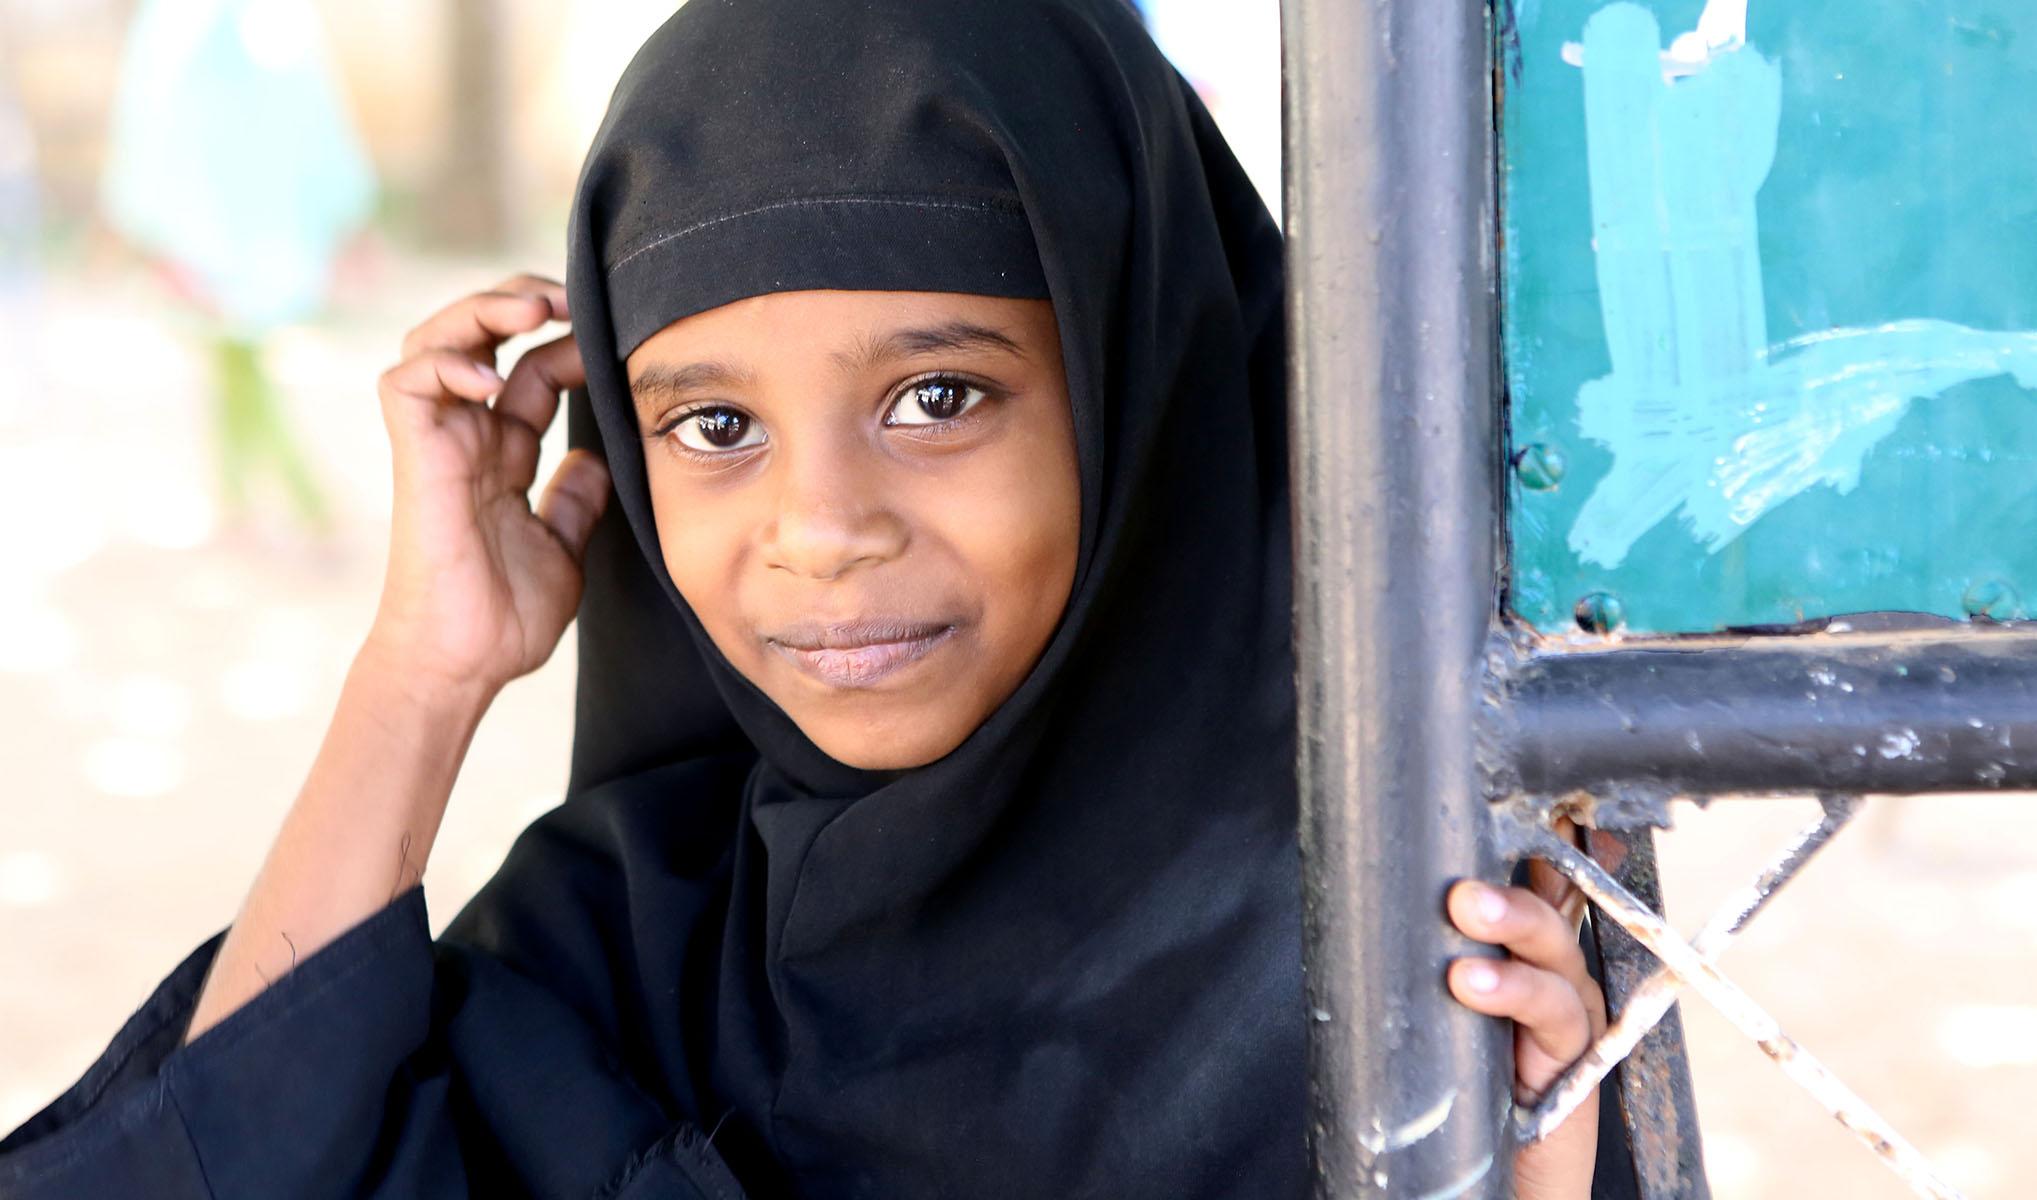 Muslim-School-Girl--Portrait-20131006_6905